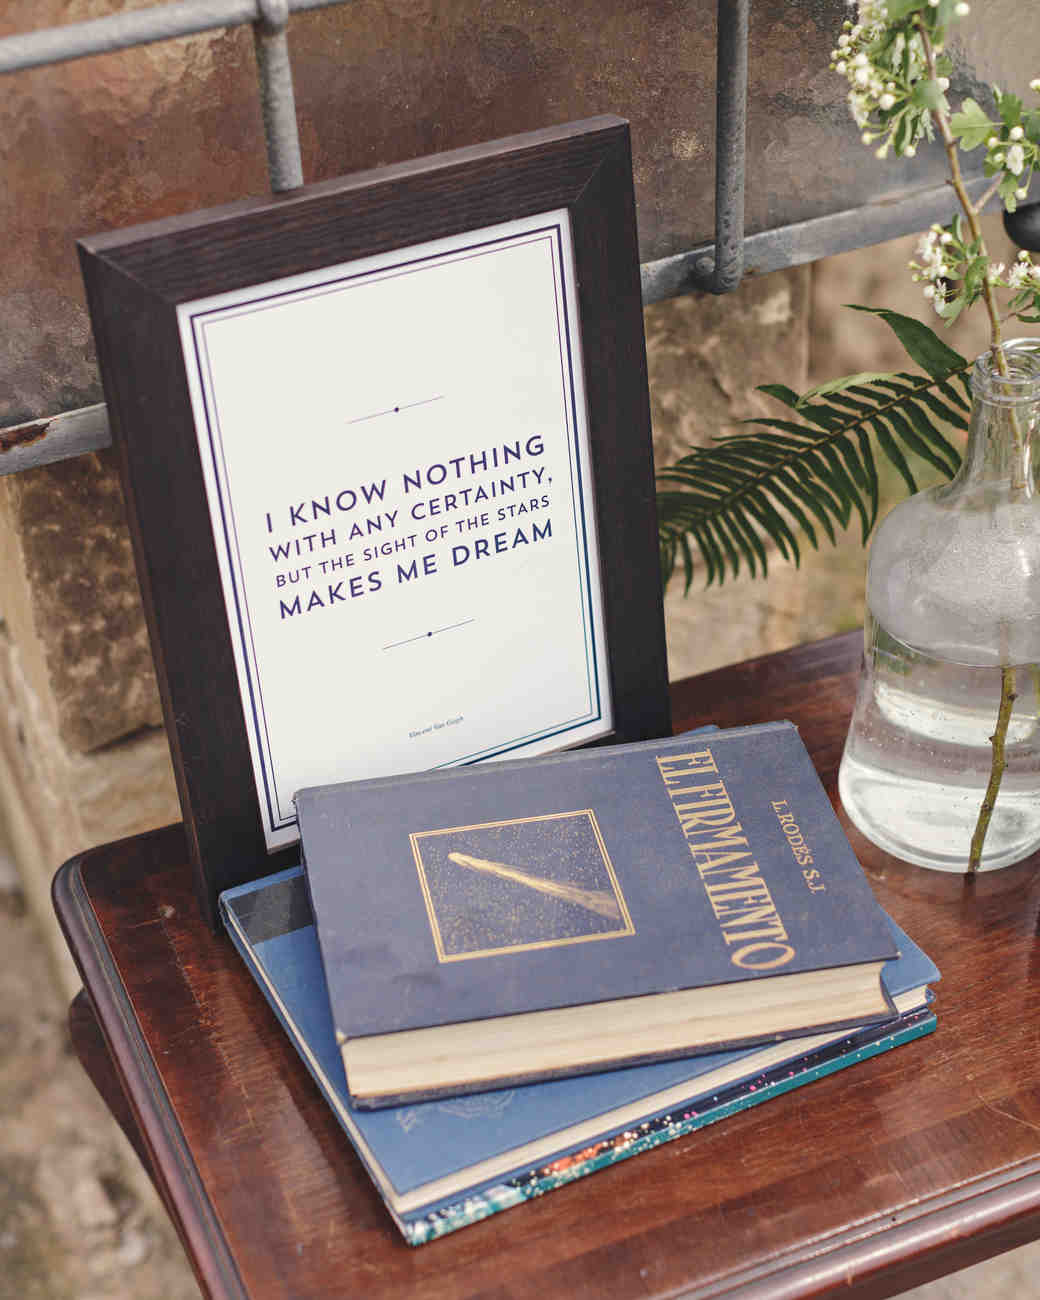 Unique Wedding Guestbook Ideas: Unique Wedding Guest Book Ideas That Aren't Actually Books